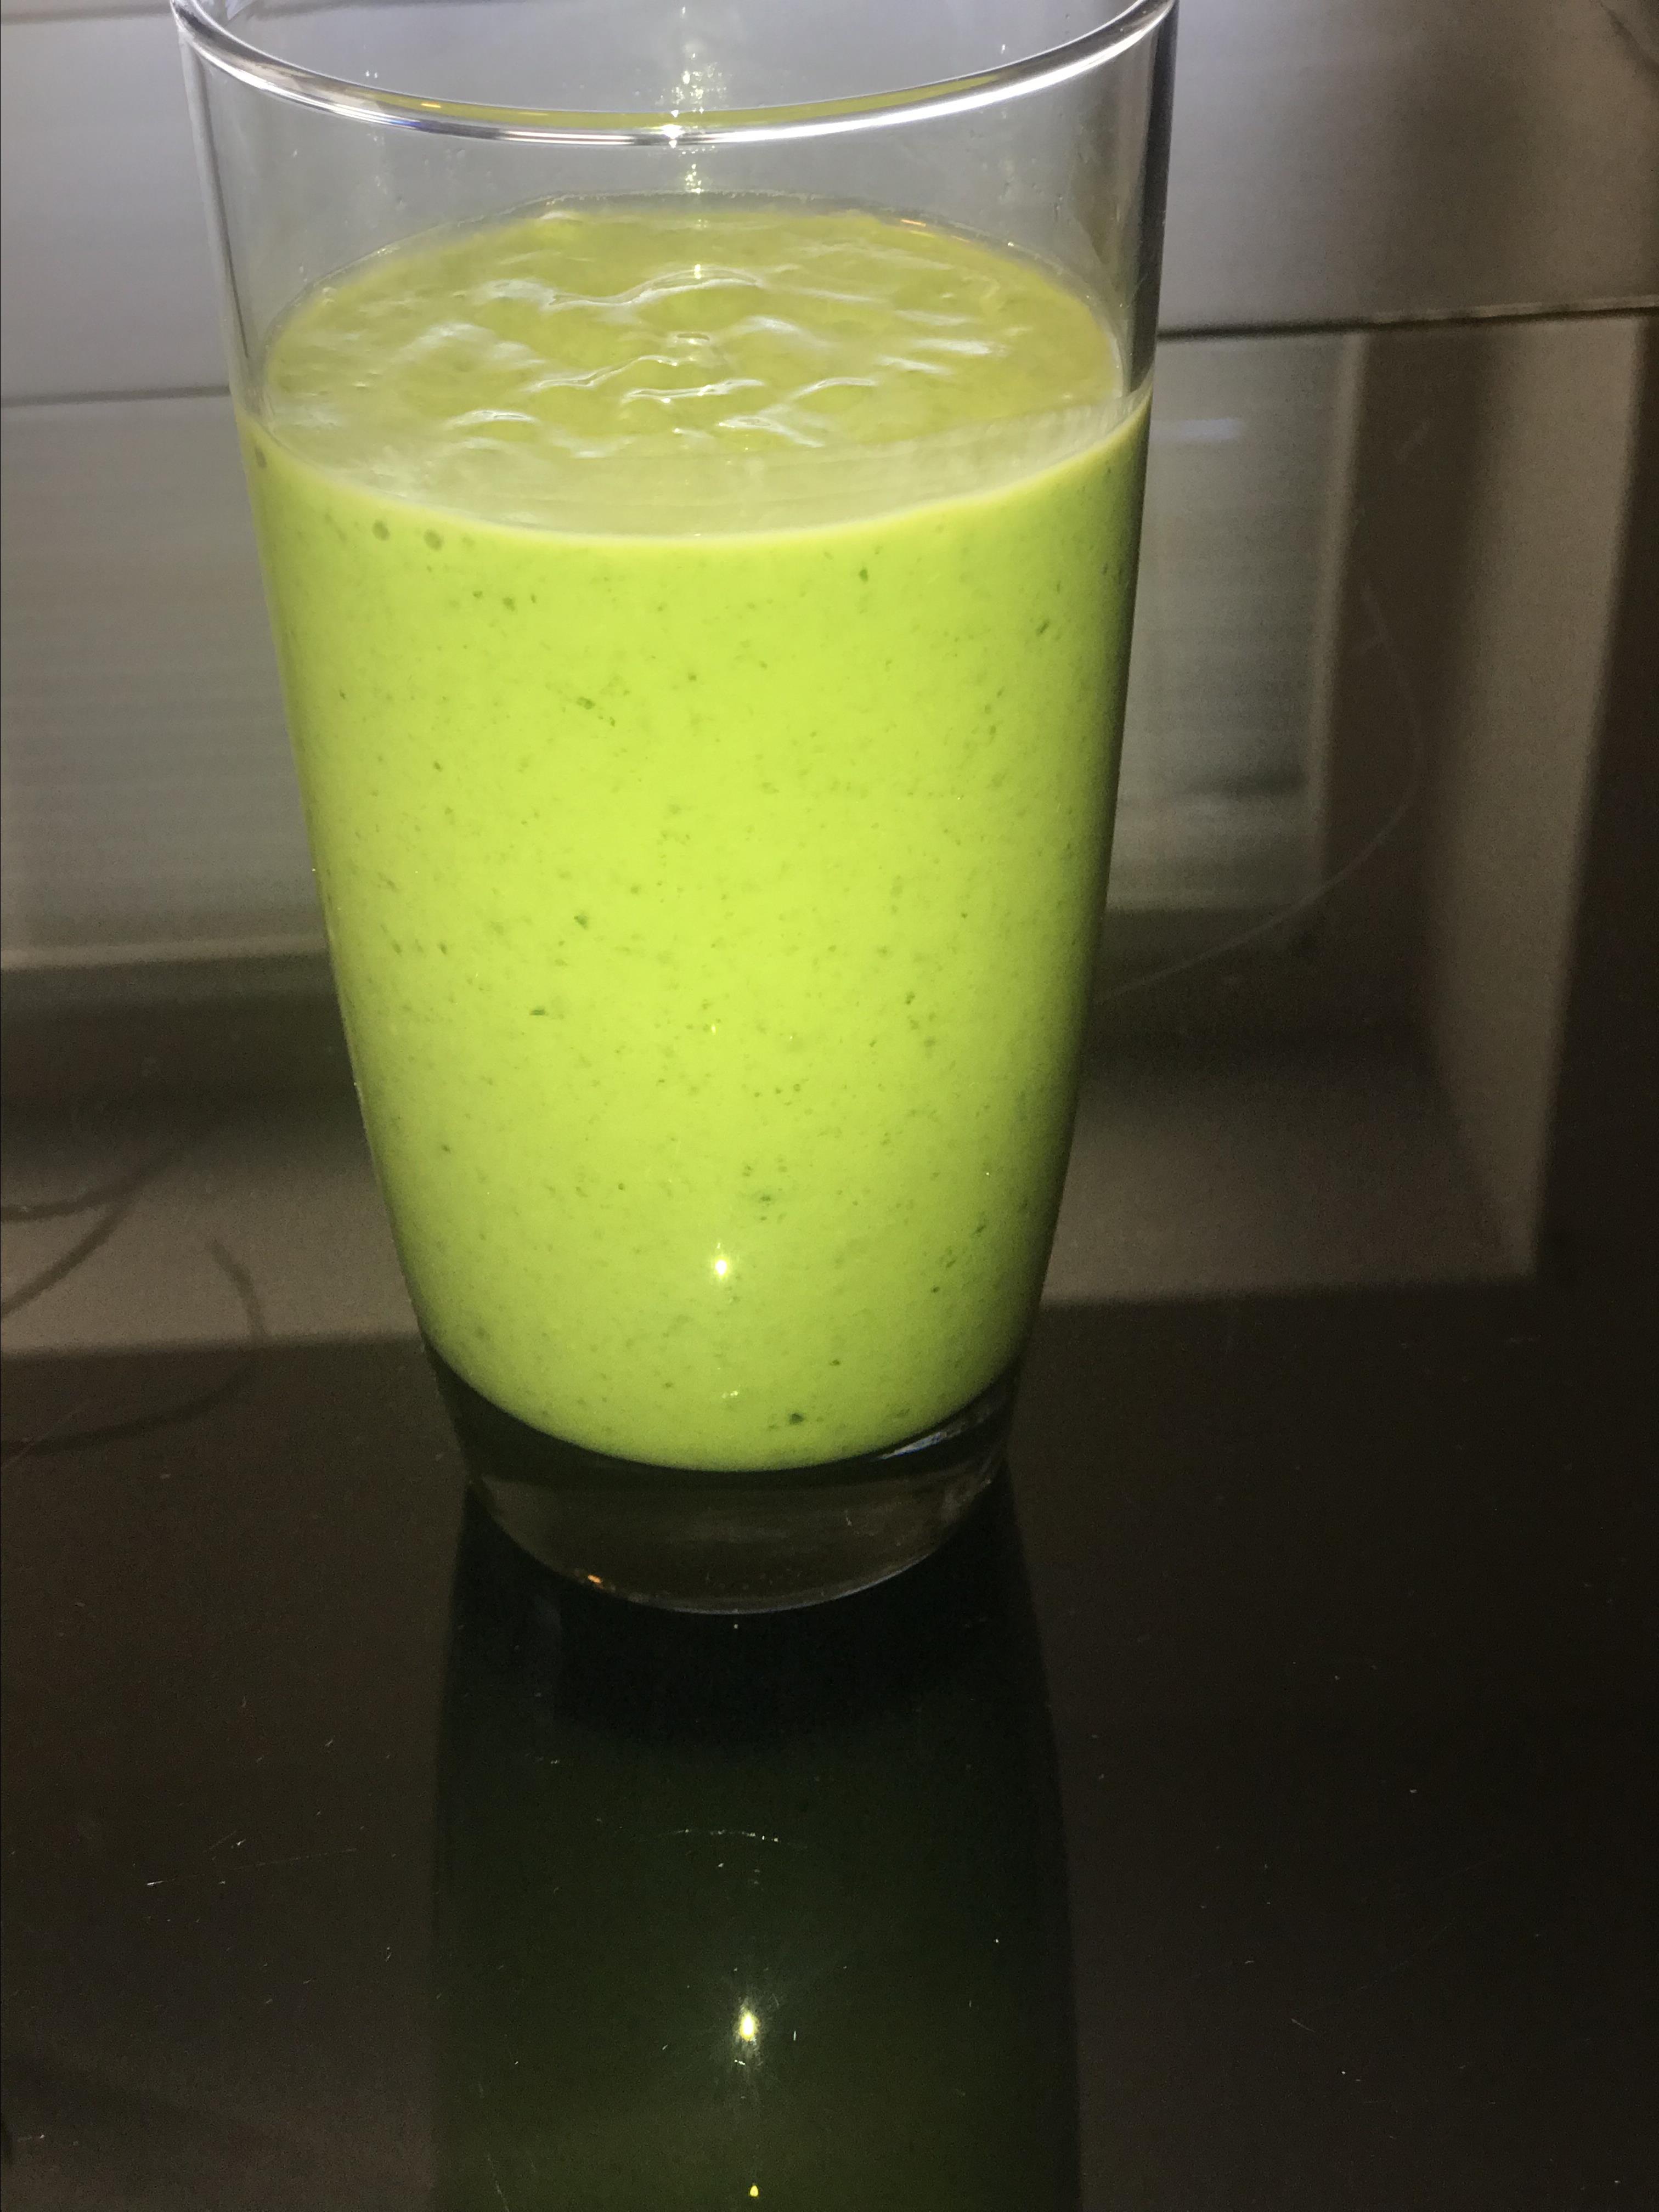 Banana, Avocado, and Spinach Smoothie